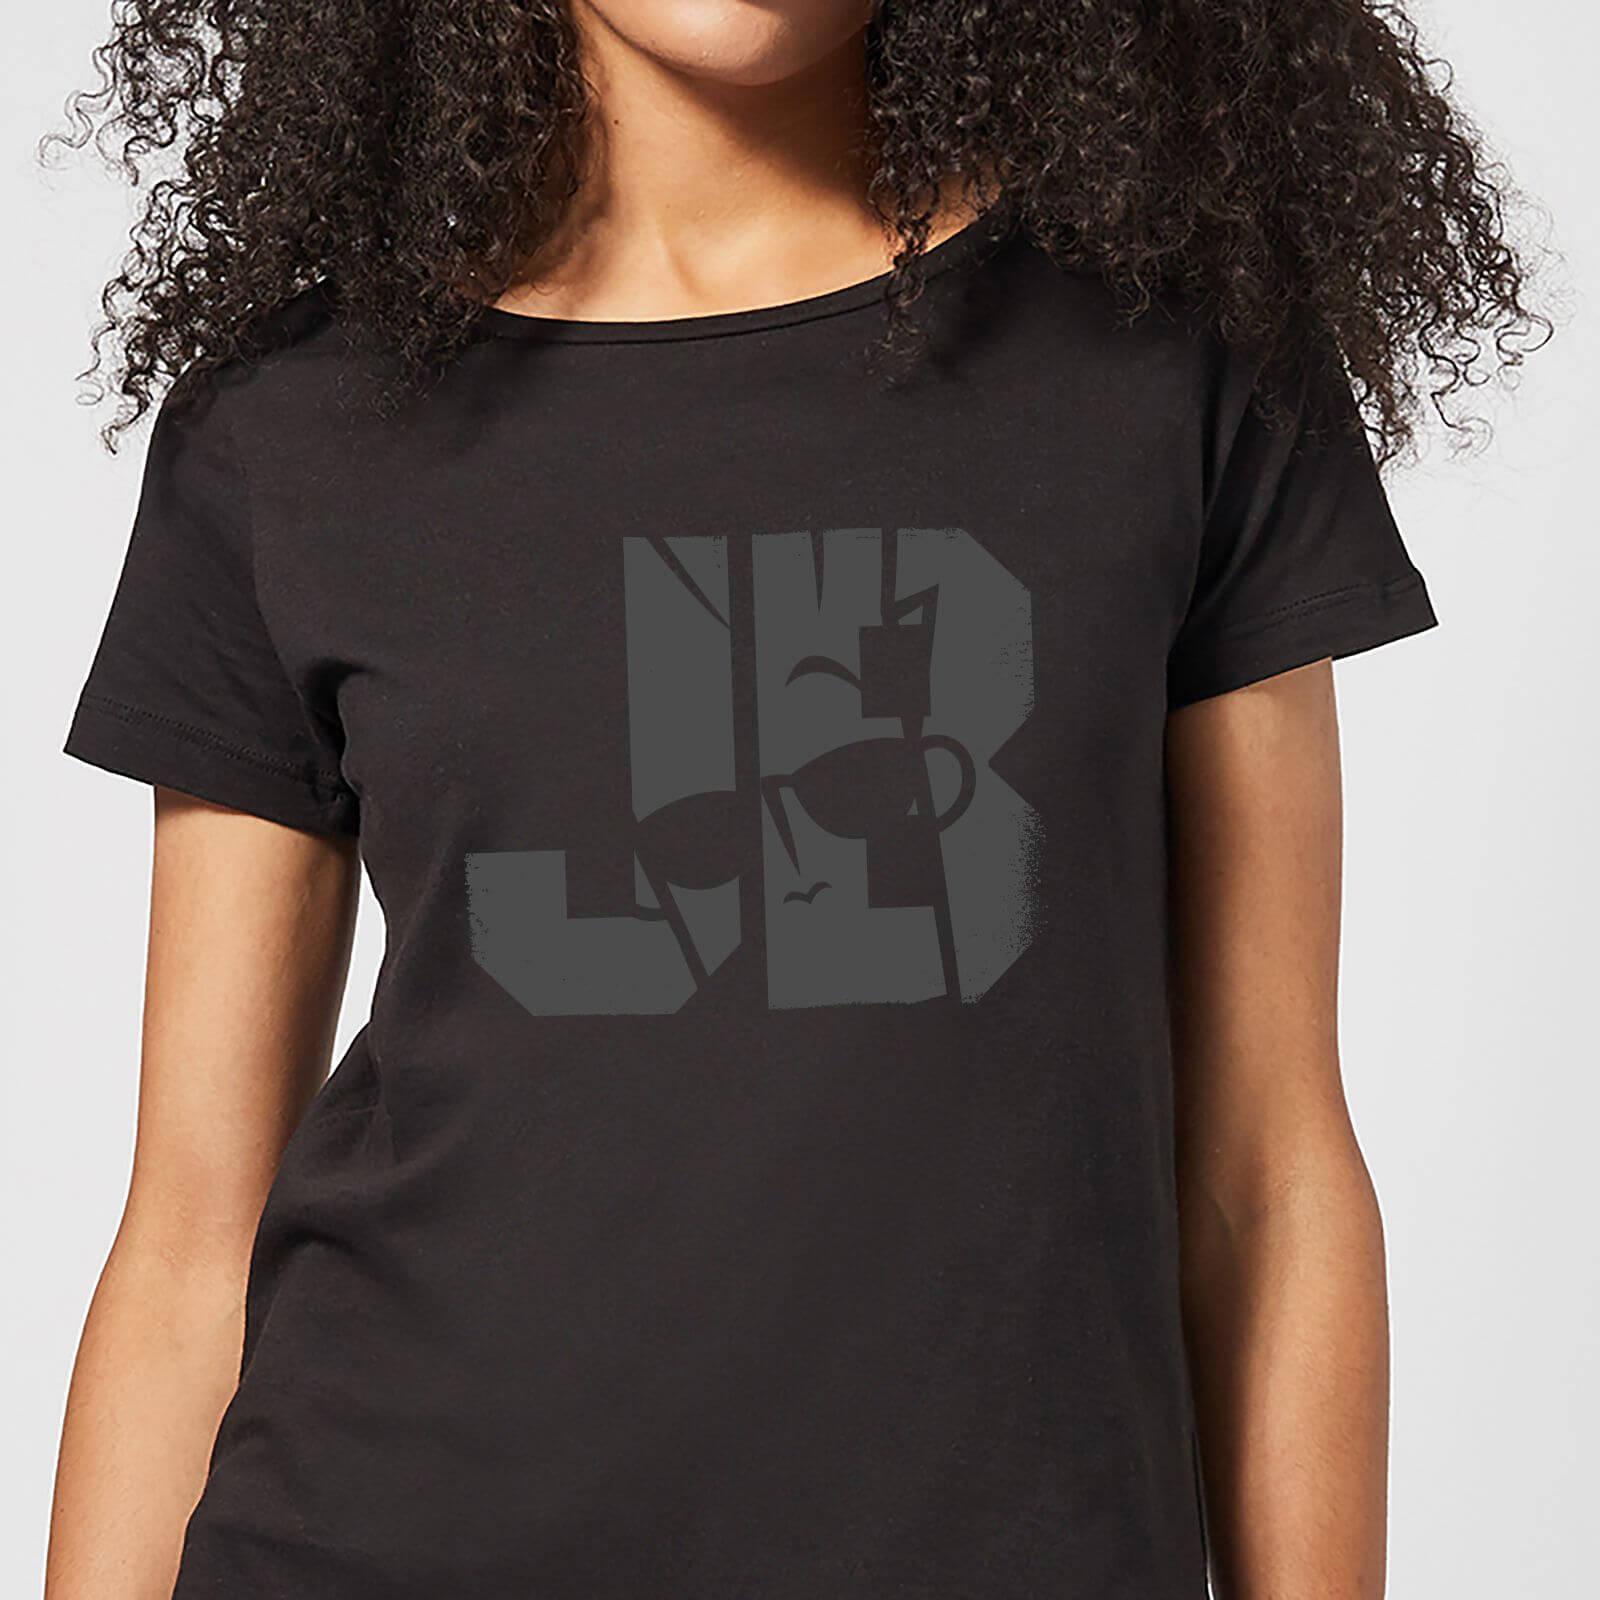 Cartoon Network Johnny Bravo JB Sillhouette Women's T-Shirt - Black - S - Black